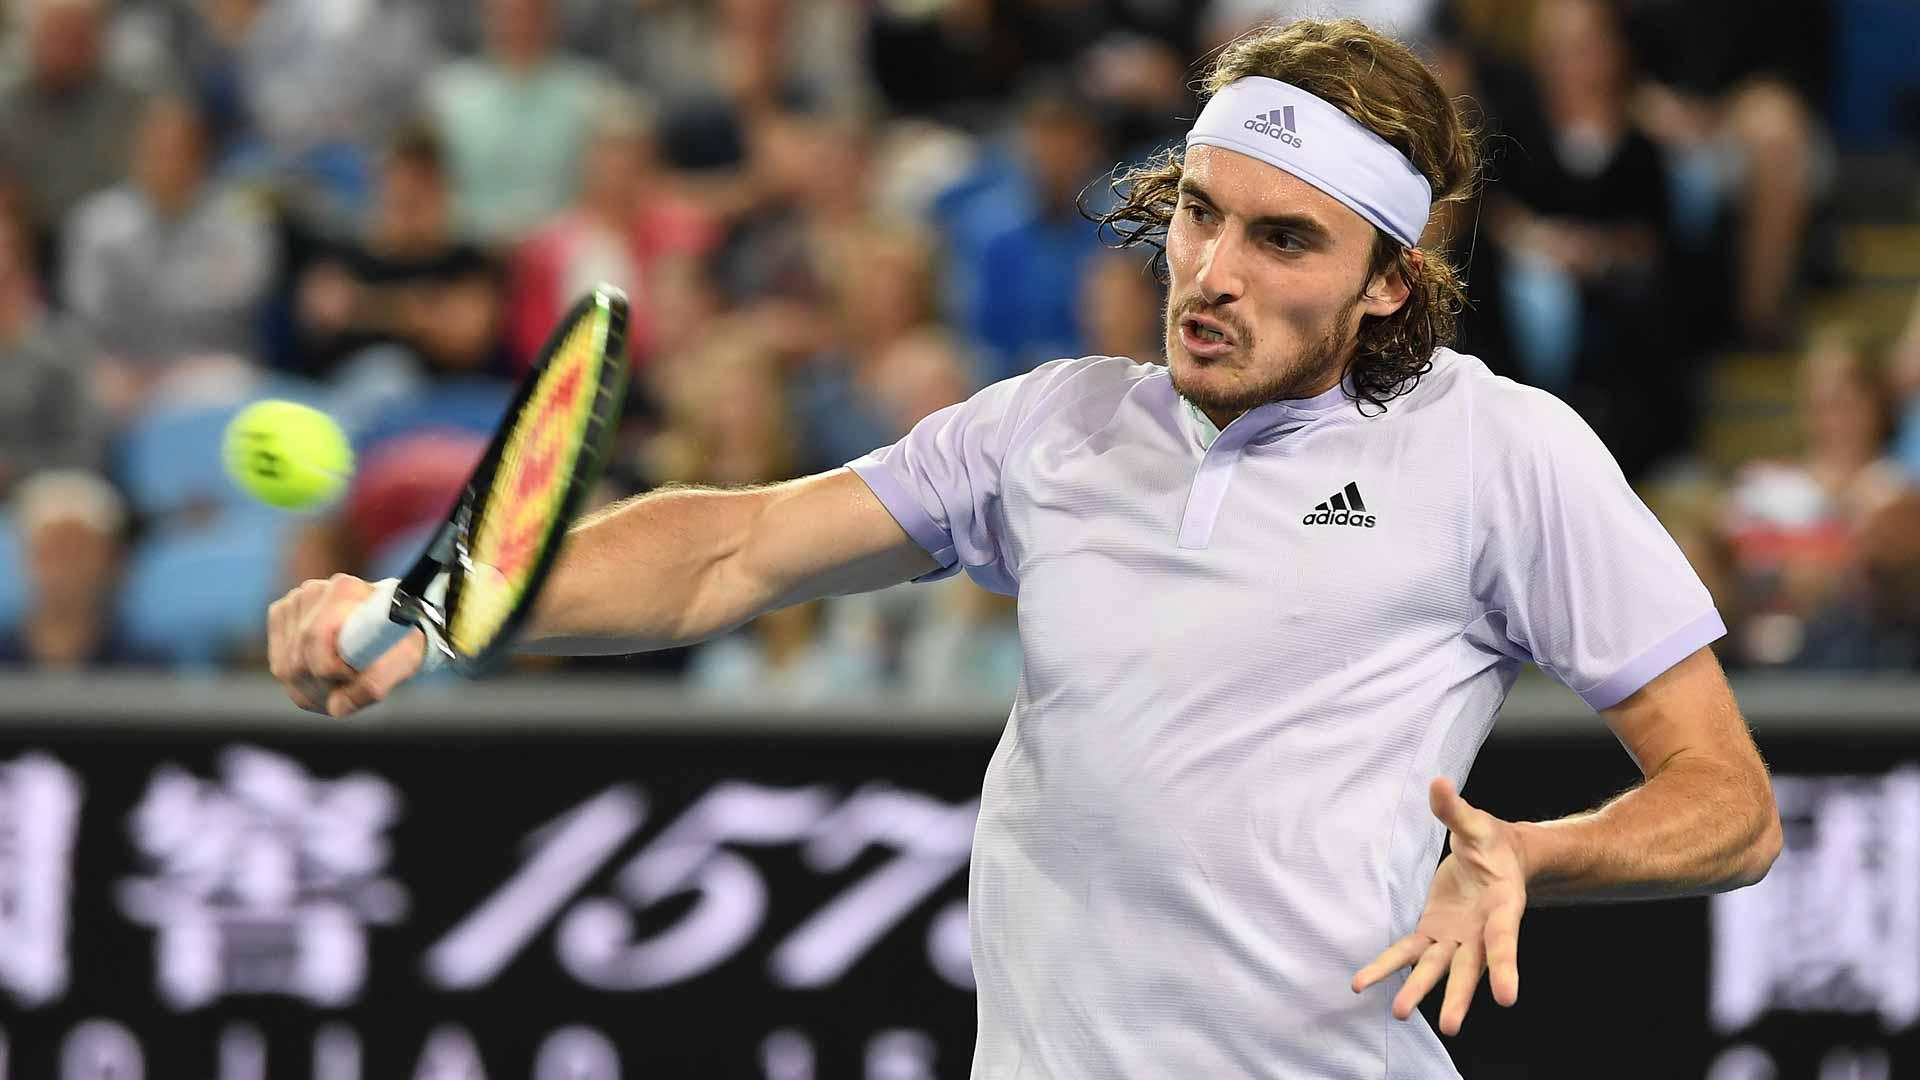 Australian Open Wednesday Preview Stefanos Tsitsipas To Face Test Novak Djokovic Roger Federer Also In Action Atp Tour The Union Journal